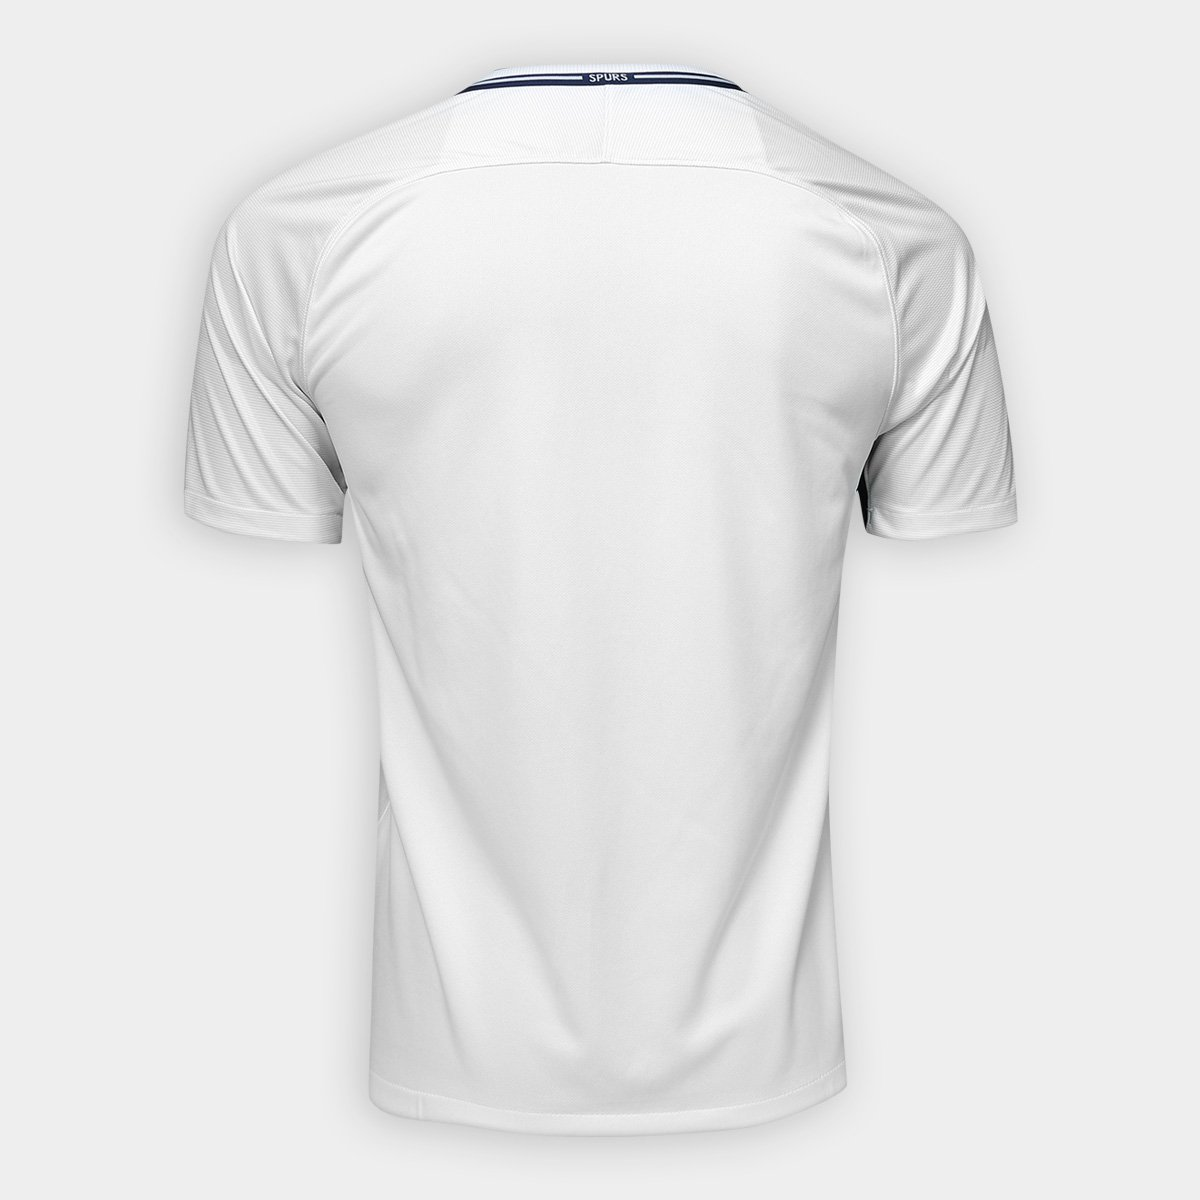 Camisa Tottenham Home 17 18 s n° - Torcedor Nike Masculina - Compre ... 9f5290a5f85df